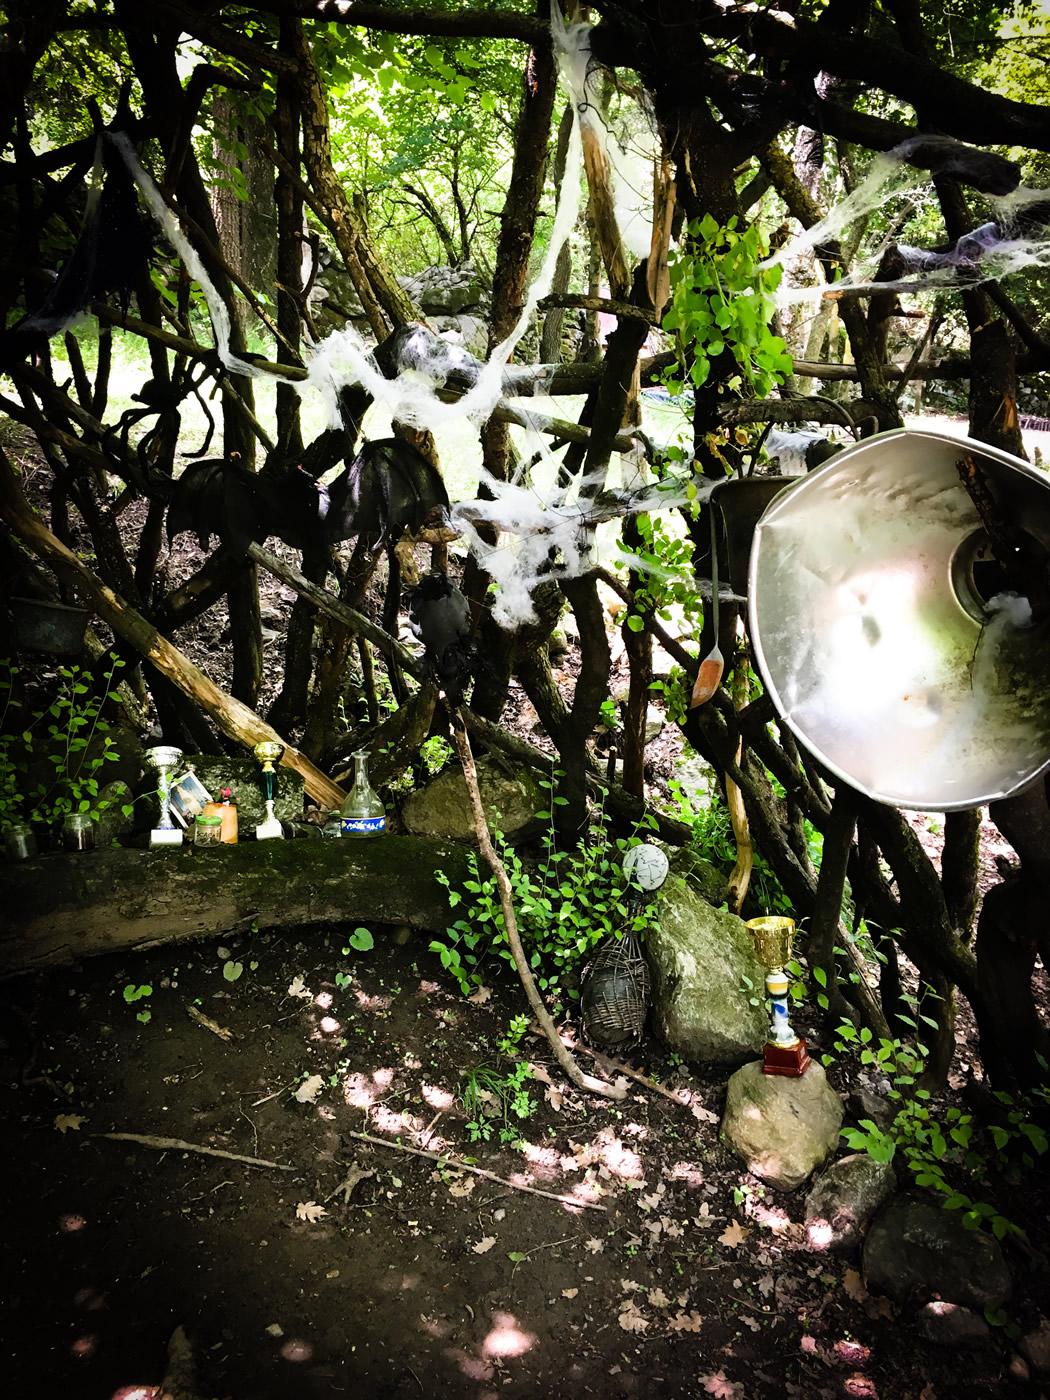 bosco delle meraviglie torino bnb 83 - 7